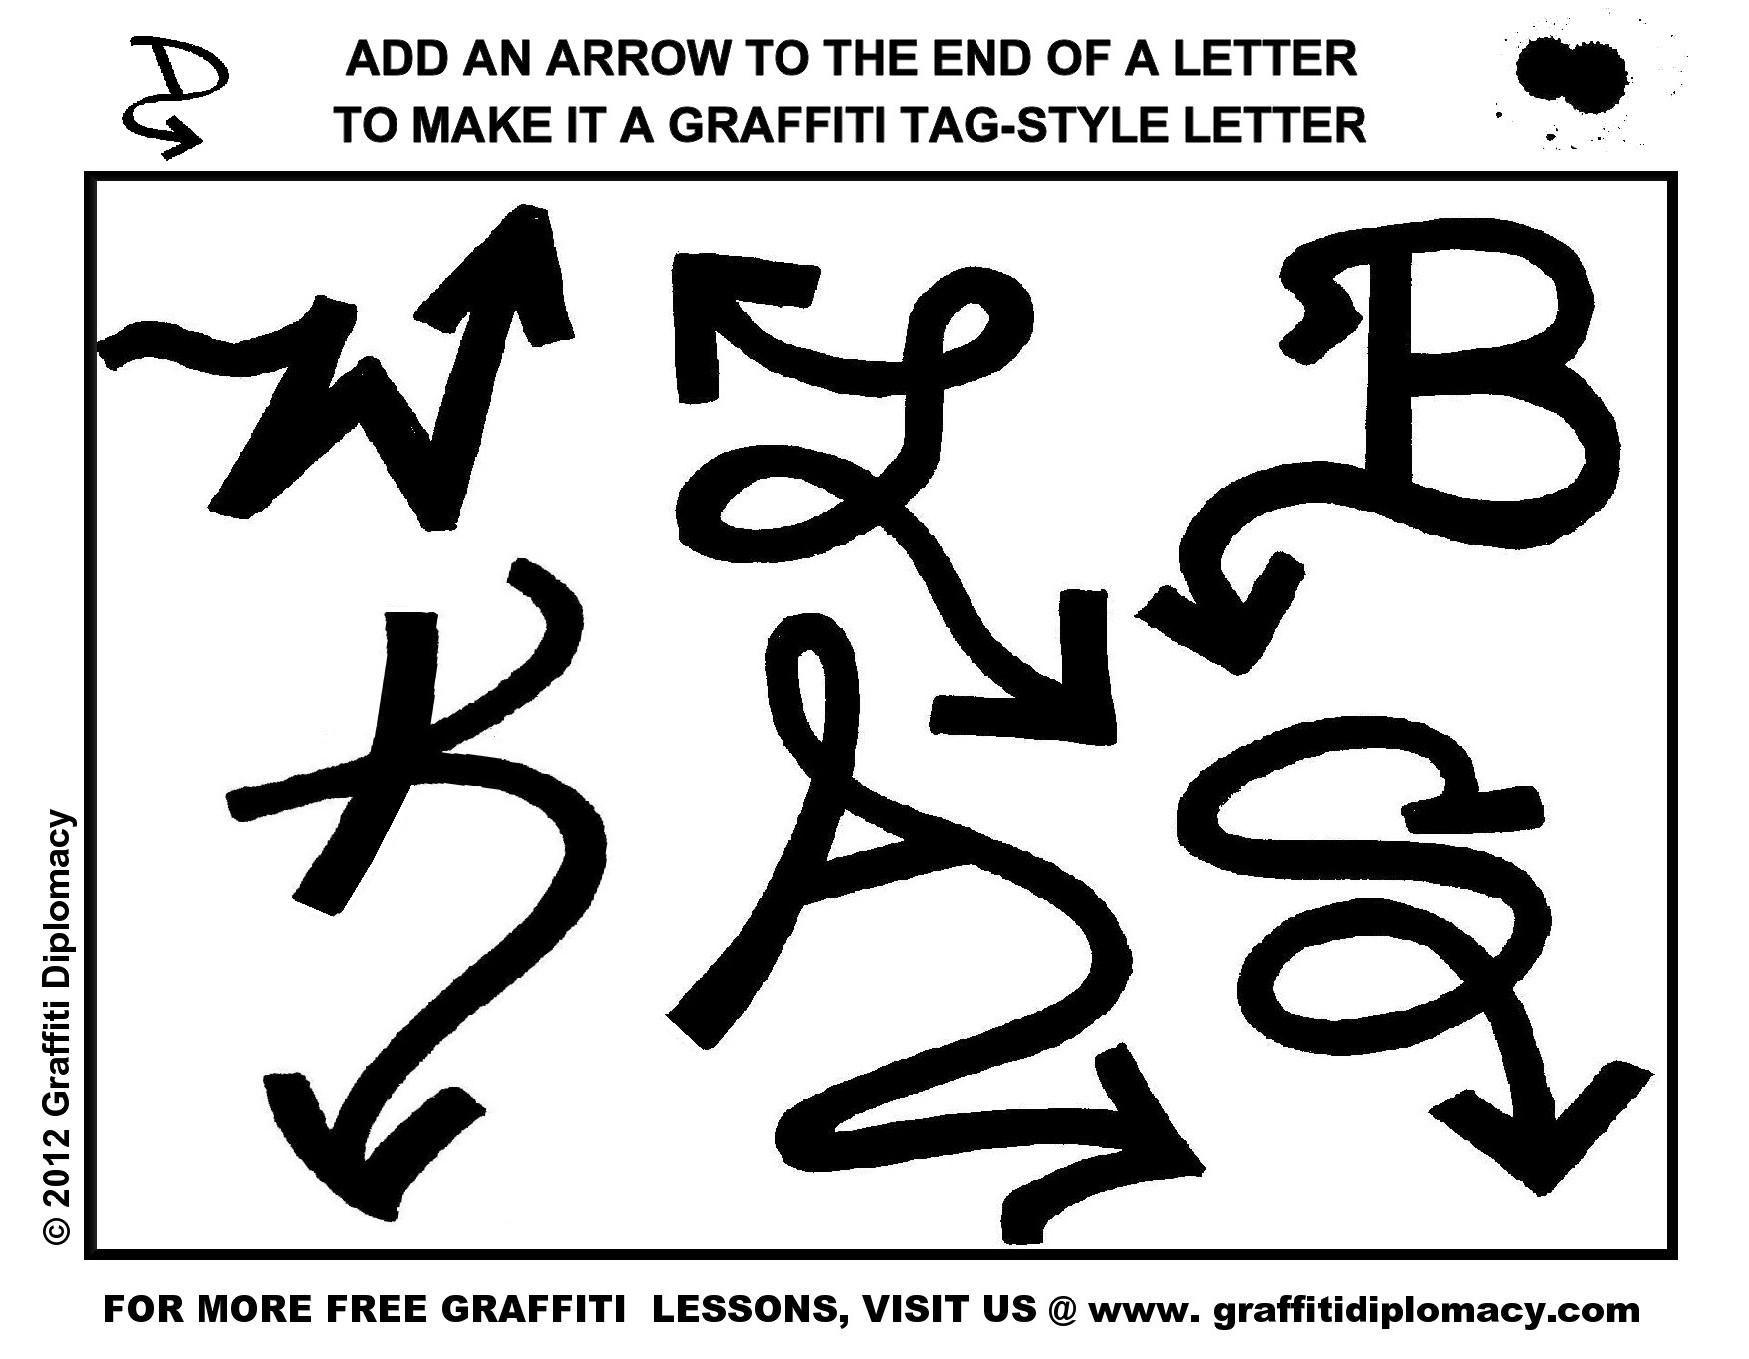 Learn How To Draw Graffiti Arrows History Of Graffiti Art Easy